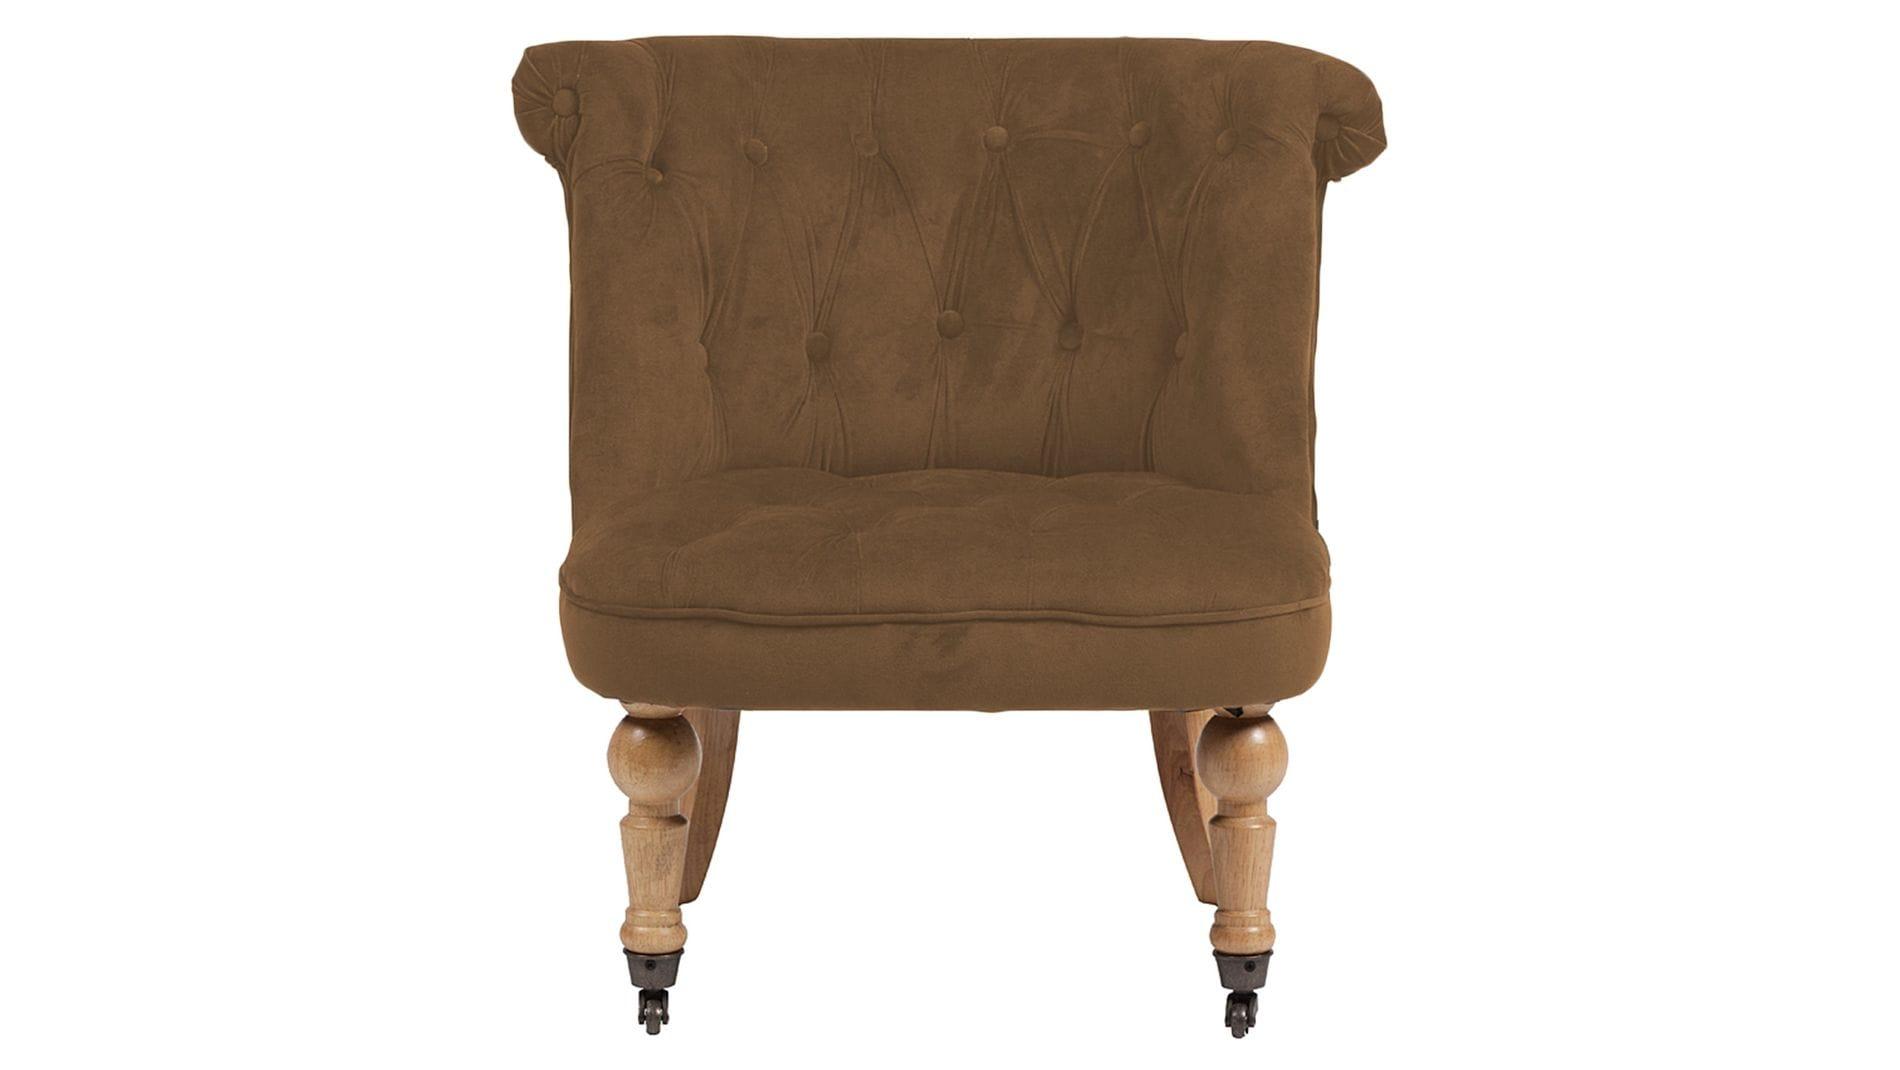 Кресло Amelie French Country Chair Коричневый Велюр М